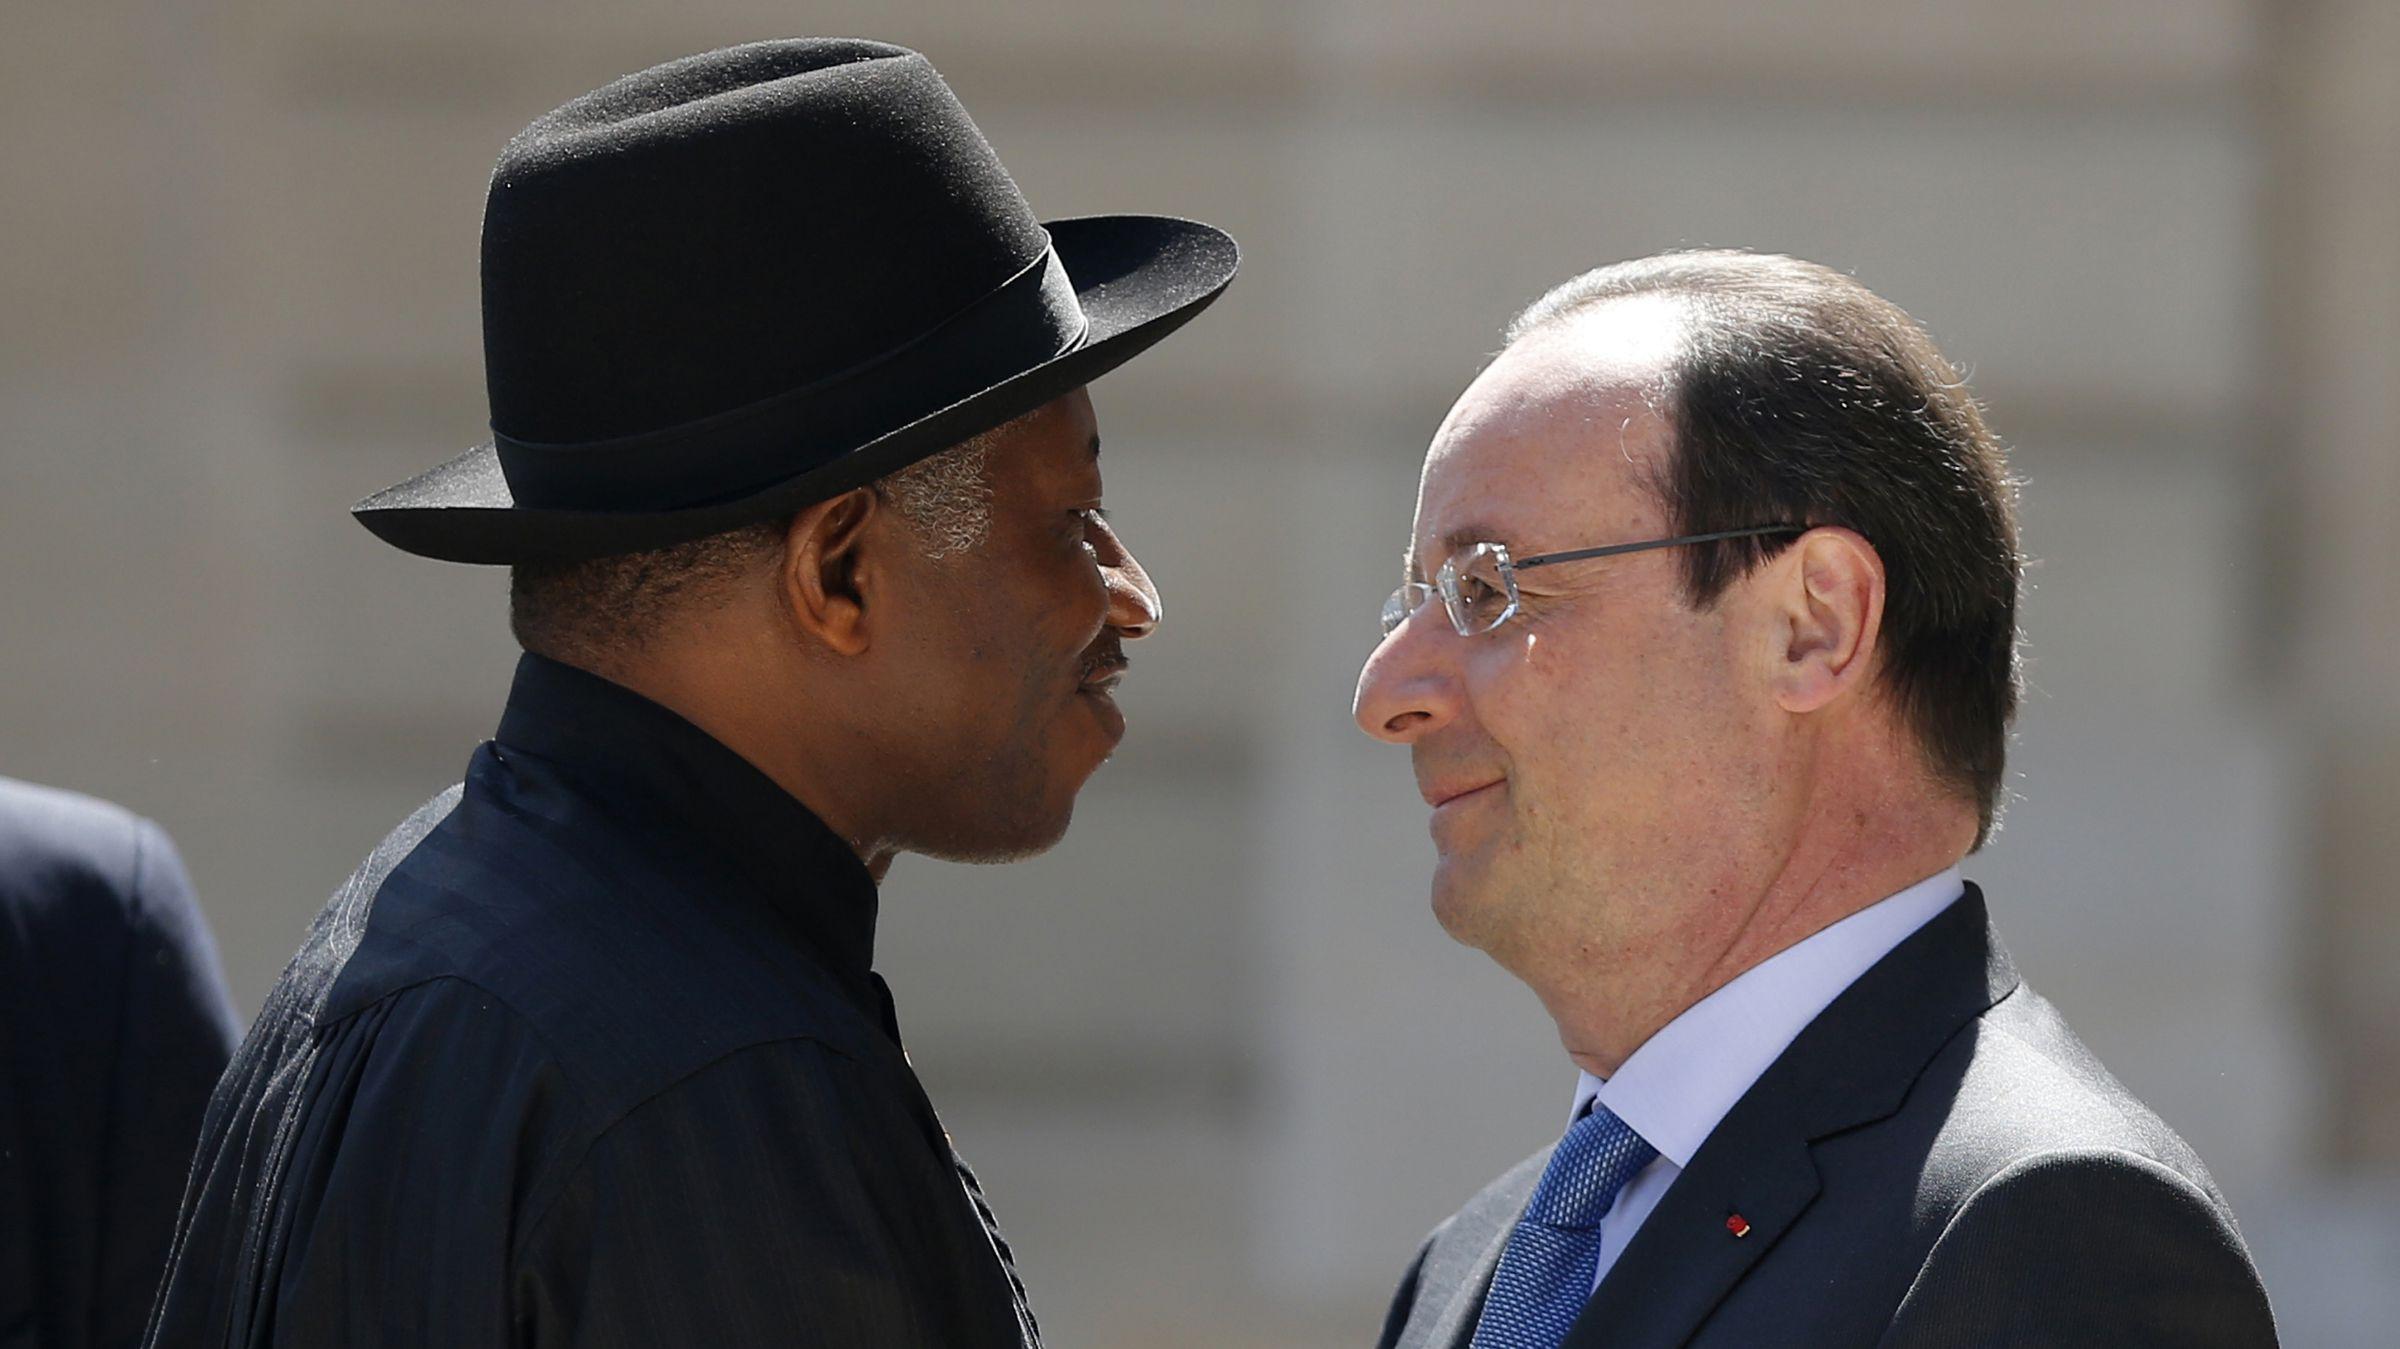 Francois Holland, Goodluck Jonathan